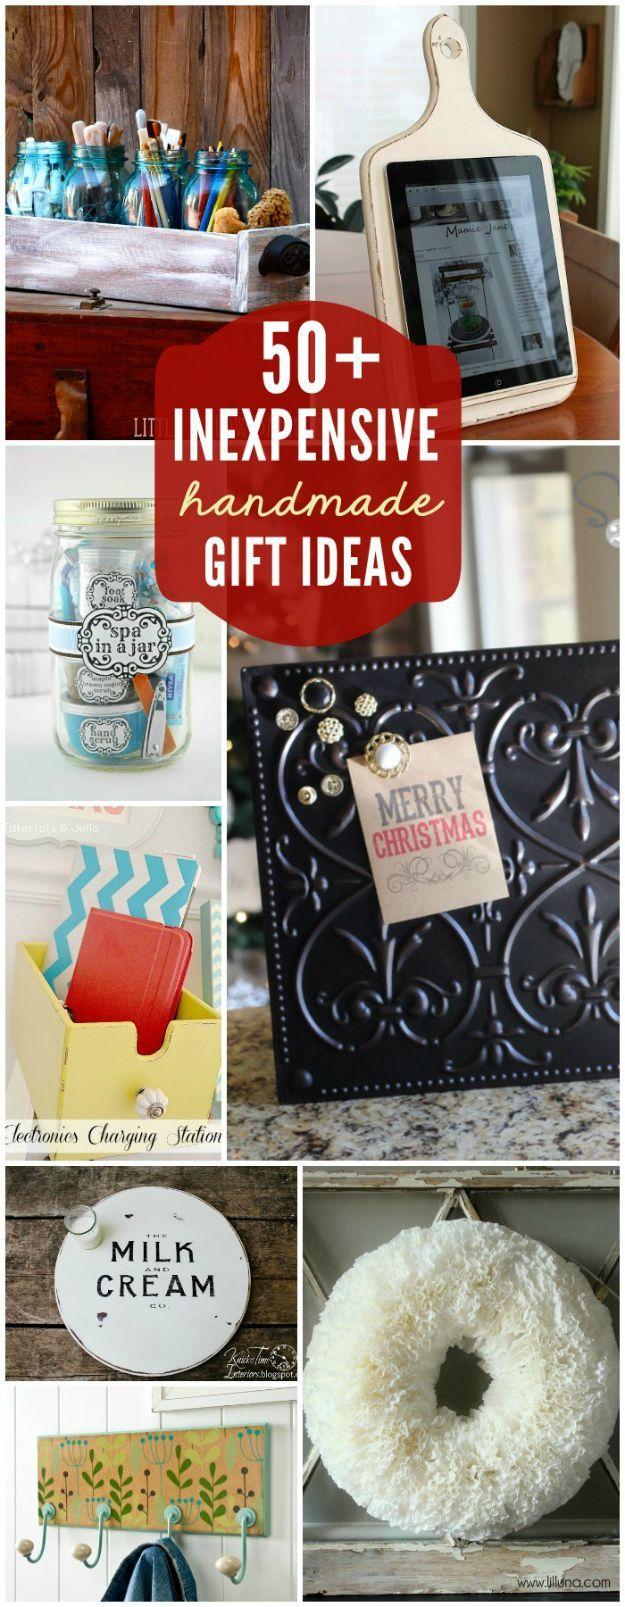 50 very cheap diy gift ideas diy ideas 4 home frugality frugal 50 very cheap diy gift ideas diy ideas 4 home frugality frugal ideas negle Images